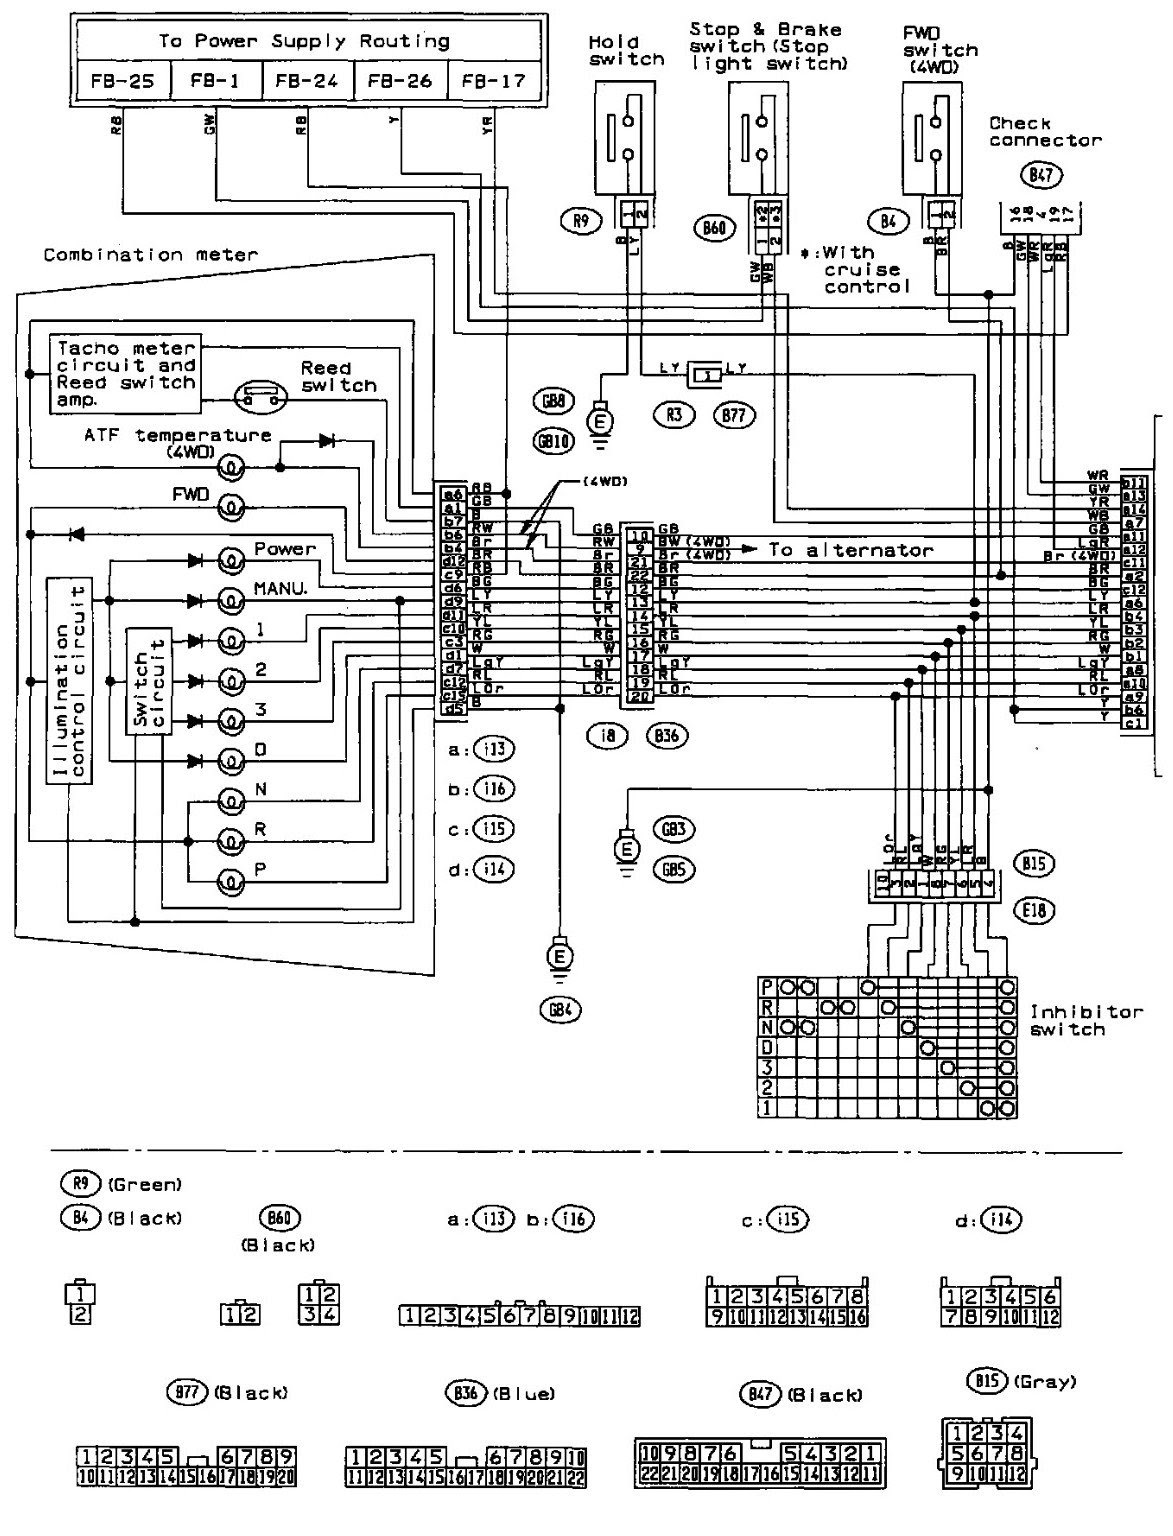 93 Subaru Legacy Wiring Diagram - Wiring Diagram NetworksWiring Diagram Networks - blogger